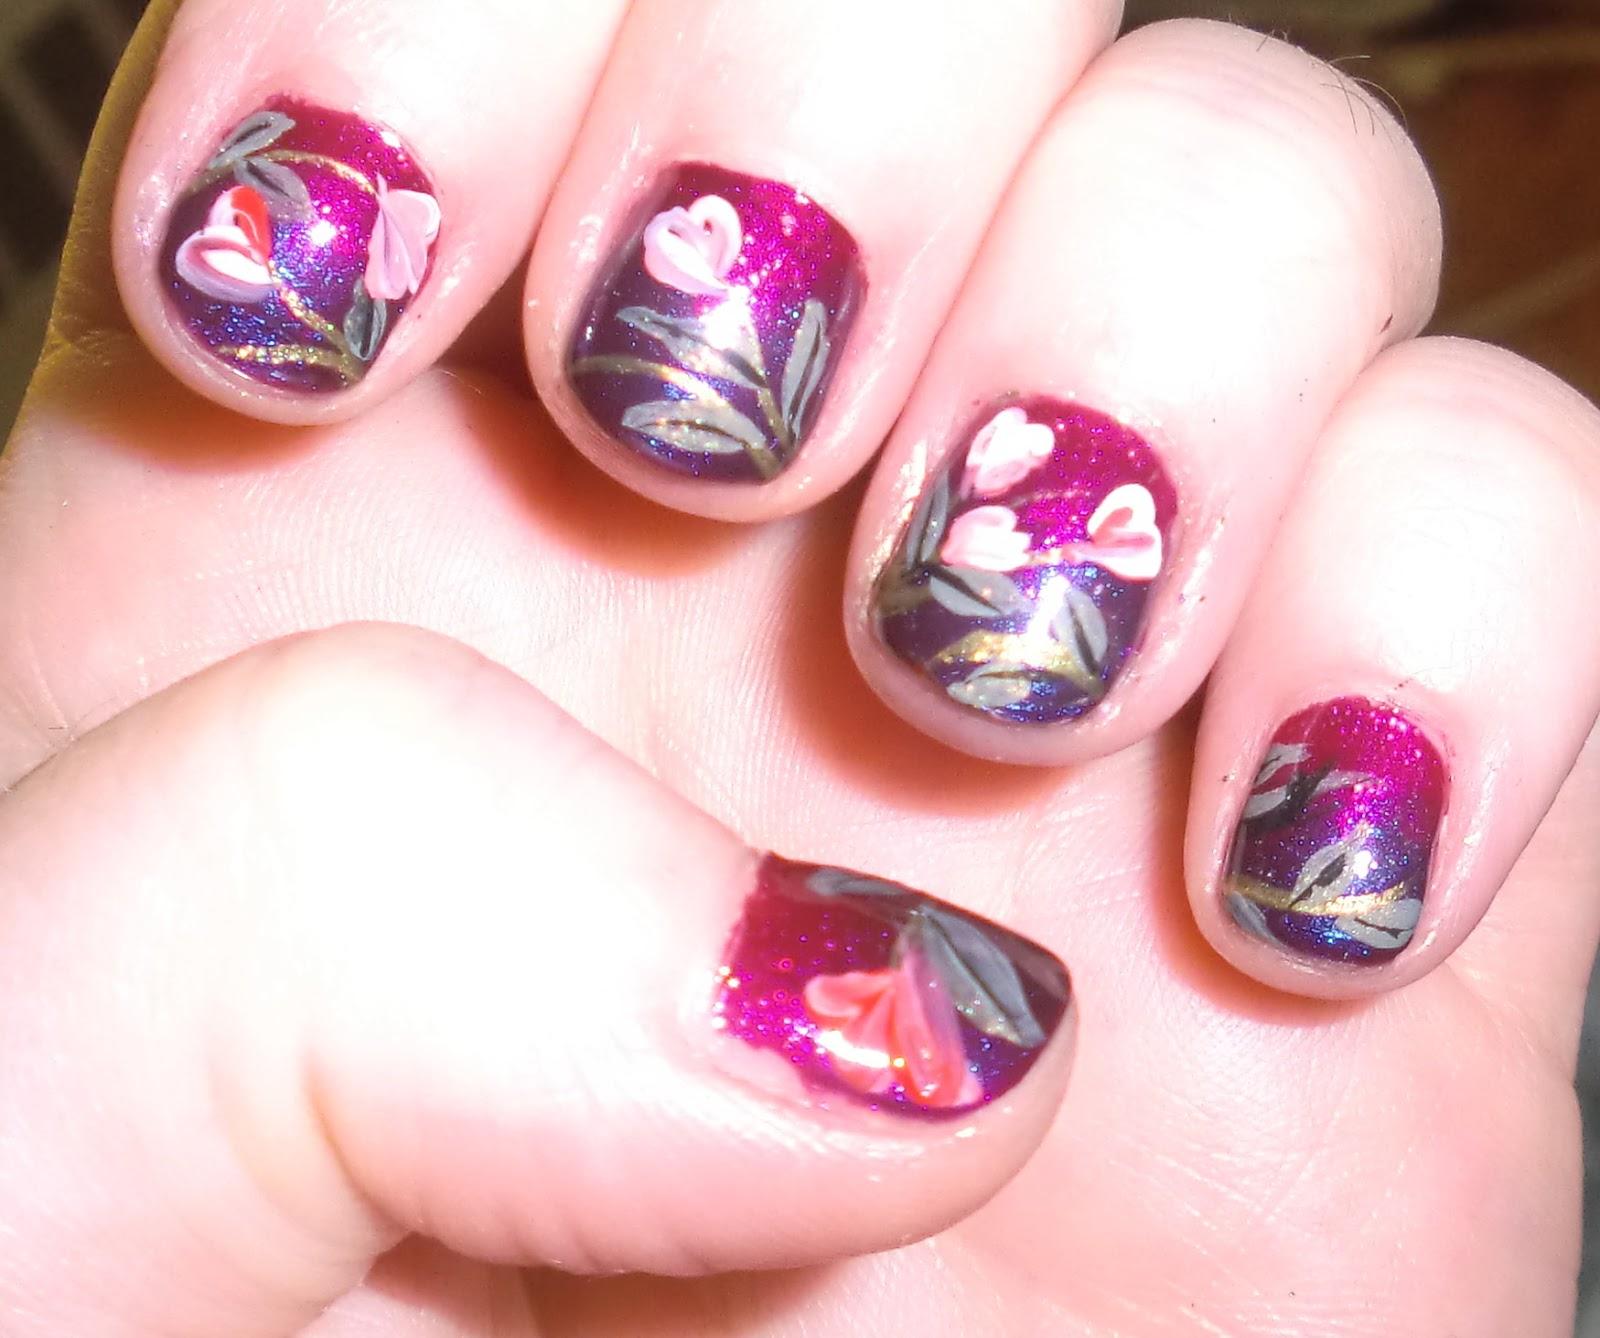 Cute Valentine Nail Art: Love4NailArt: Cute Floral Valentine's Day Nail Art For